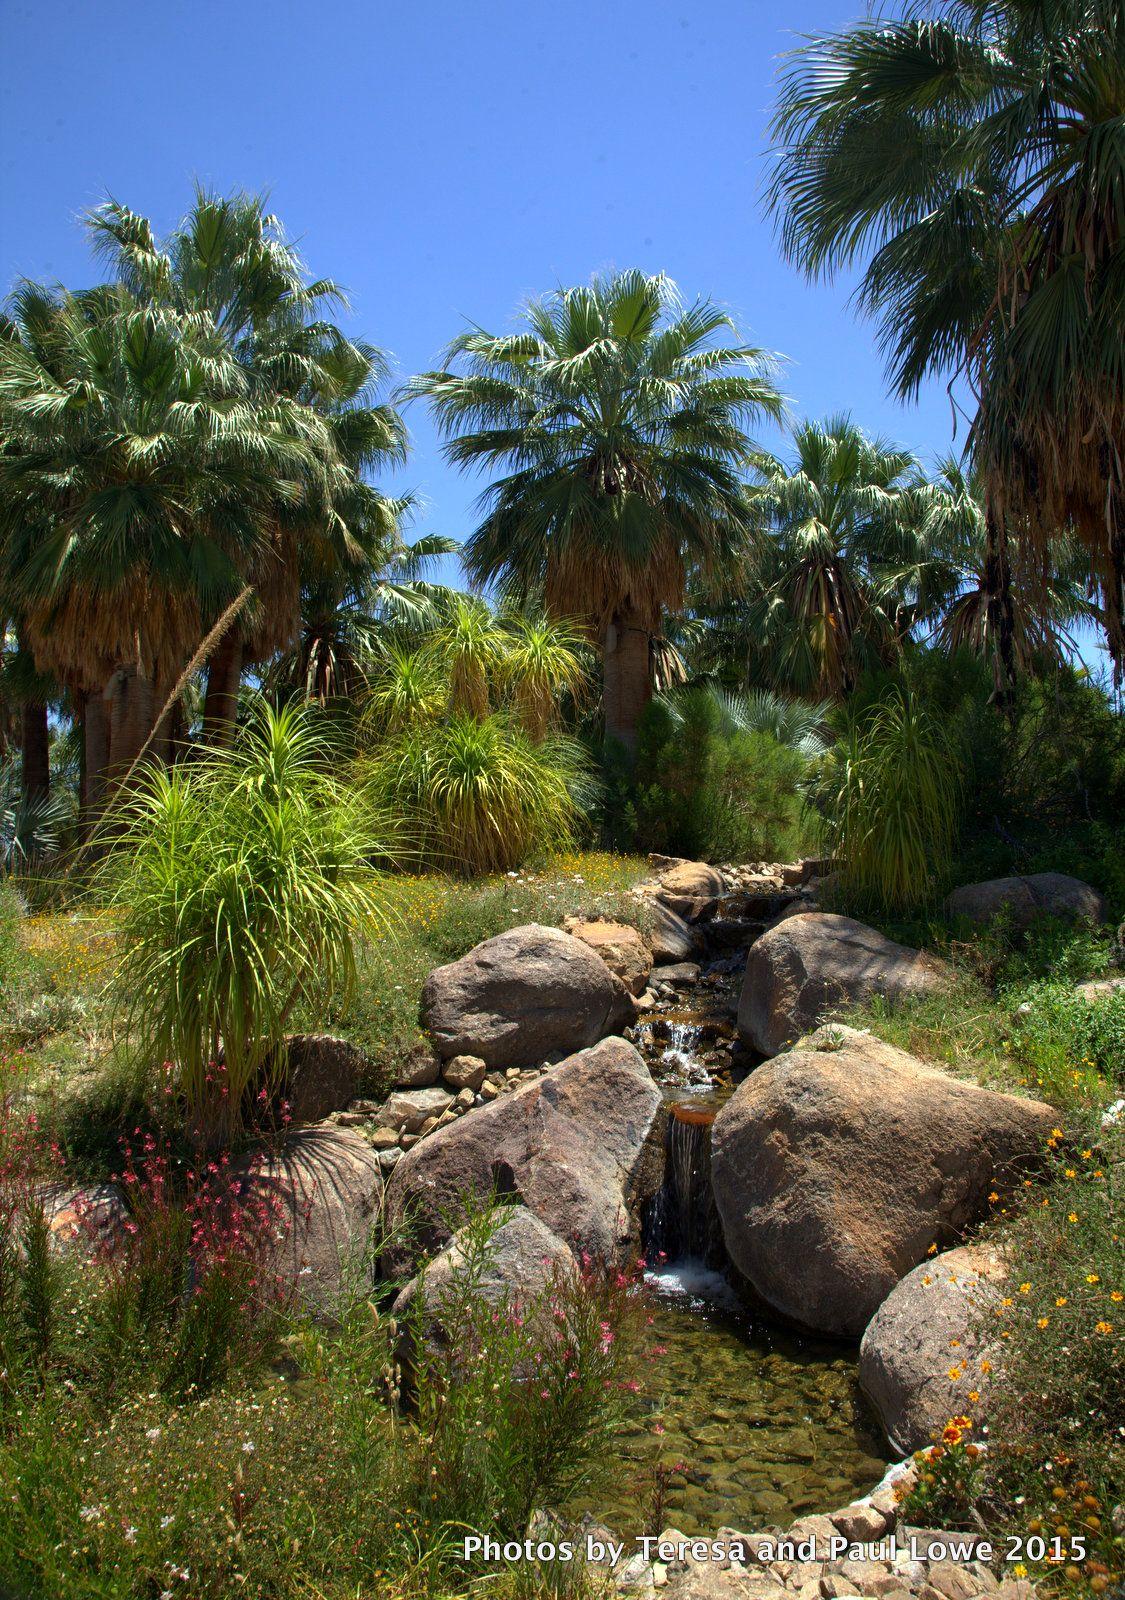 5ebfc41b6ef0ebc6741c2a8013f104c9 - The Living Desert Zoo & Botanical Gardens